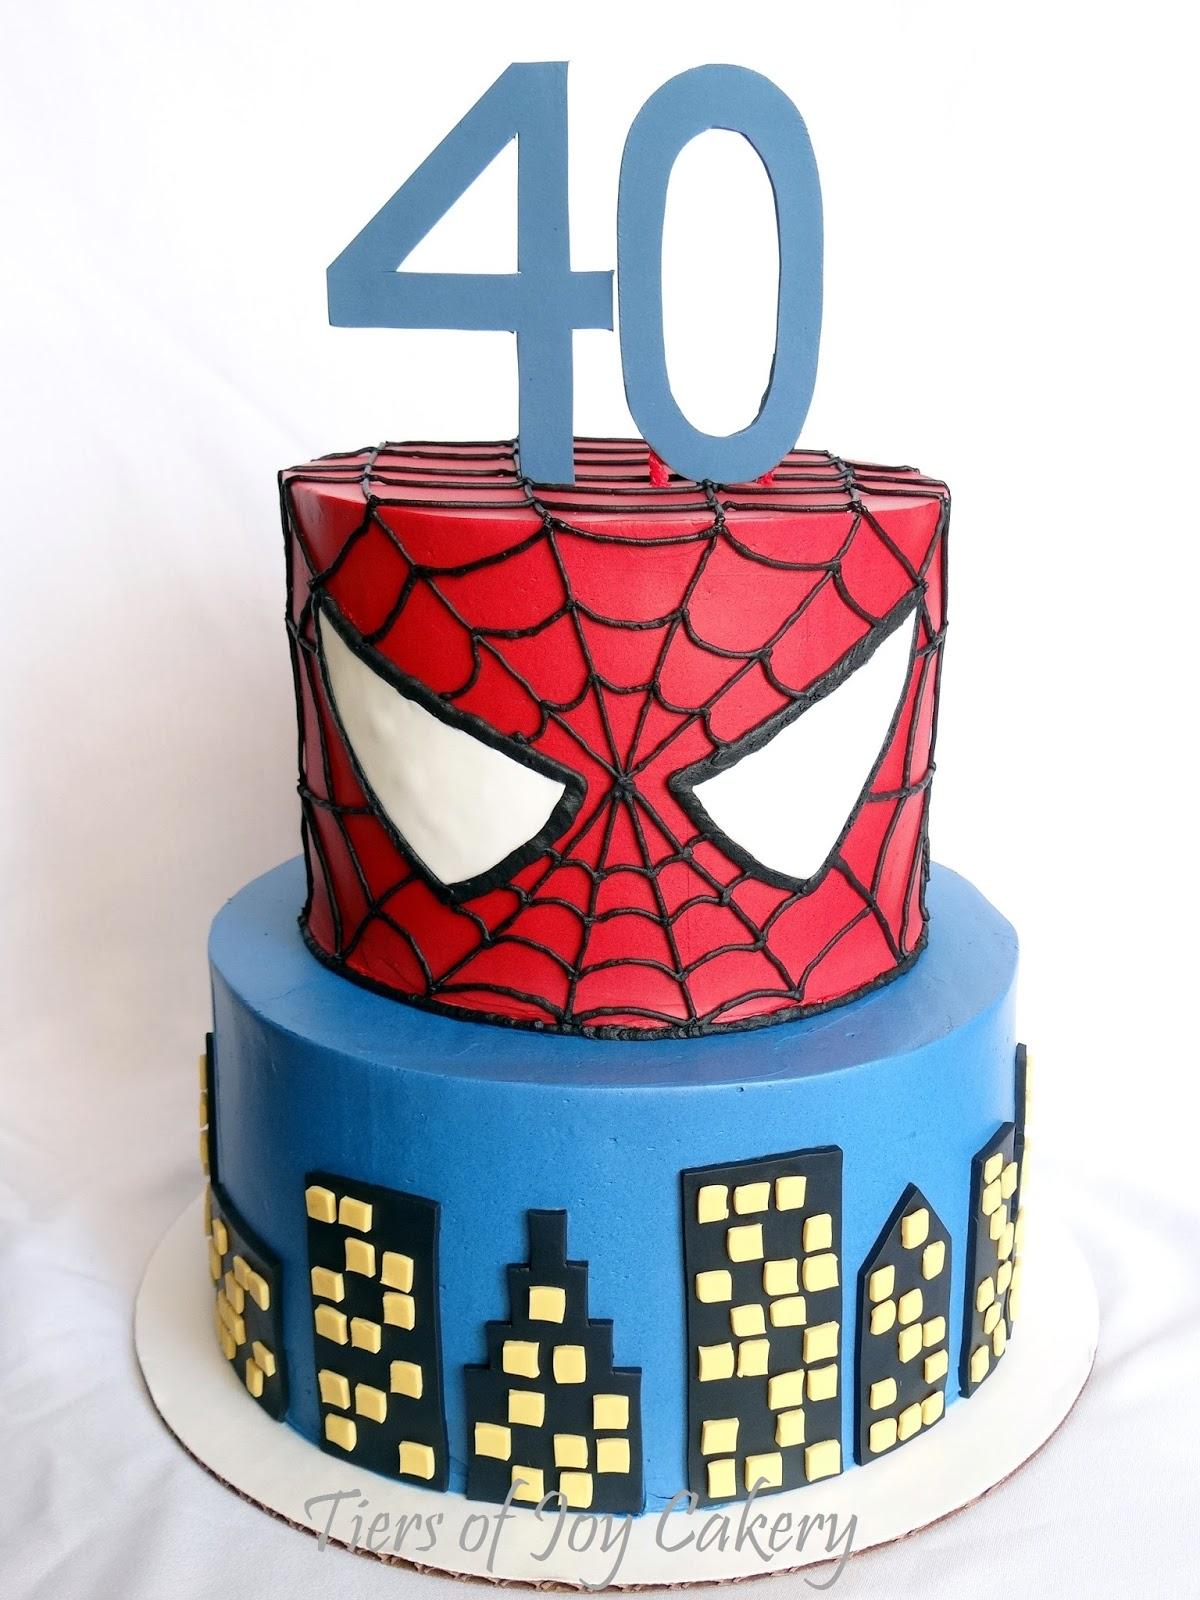 How To Make Spiderman Ice Cream Cake